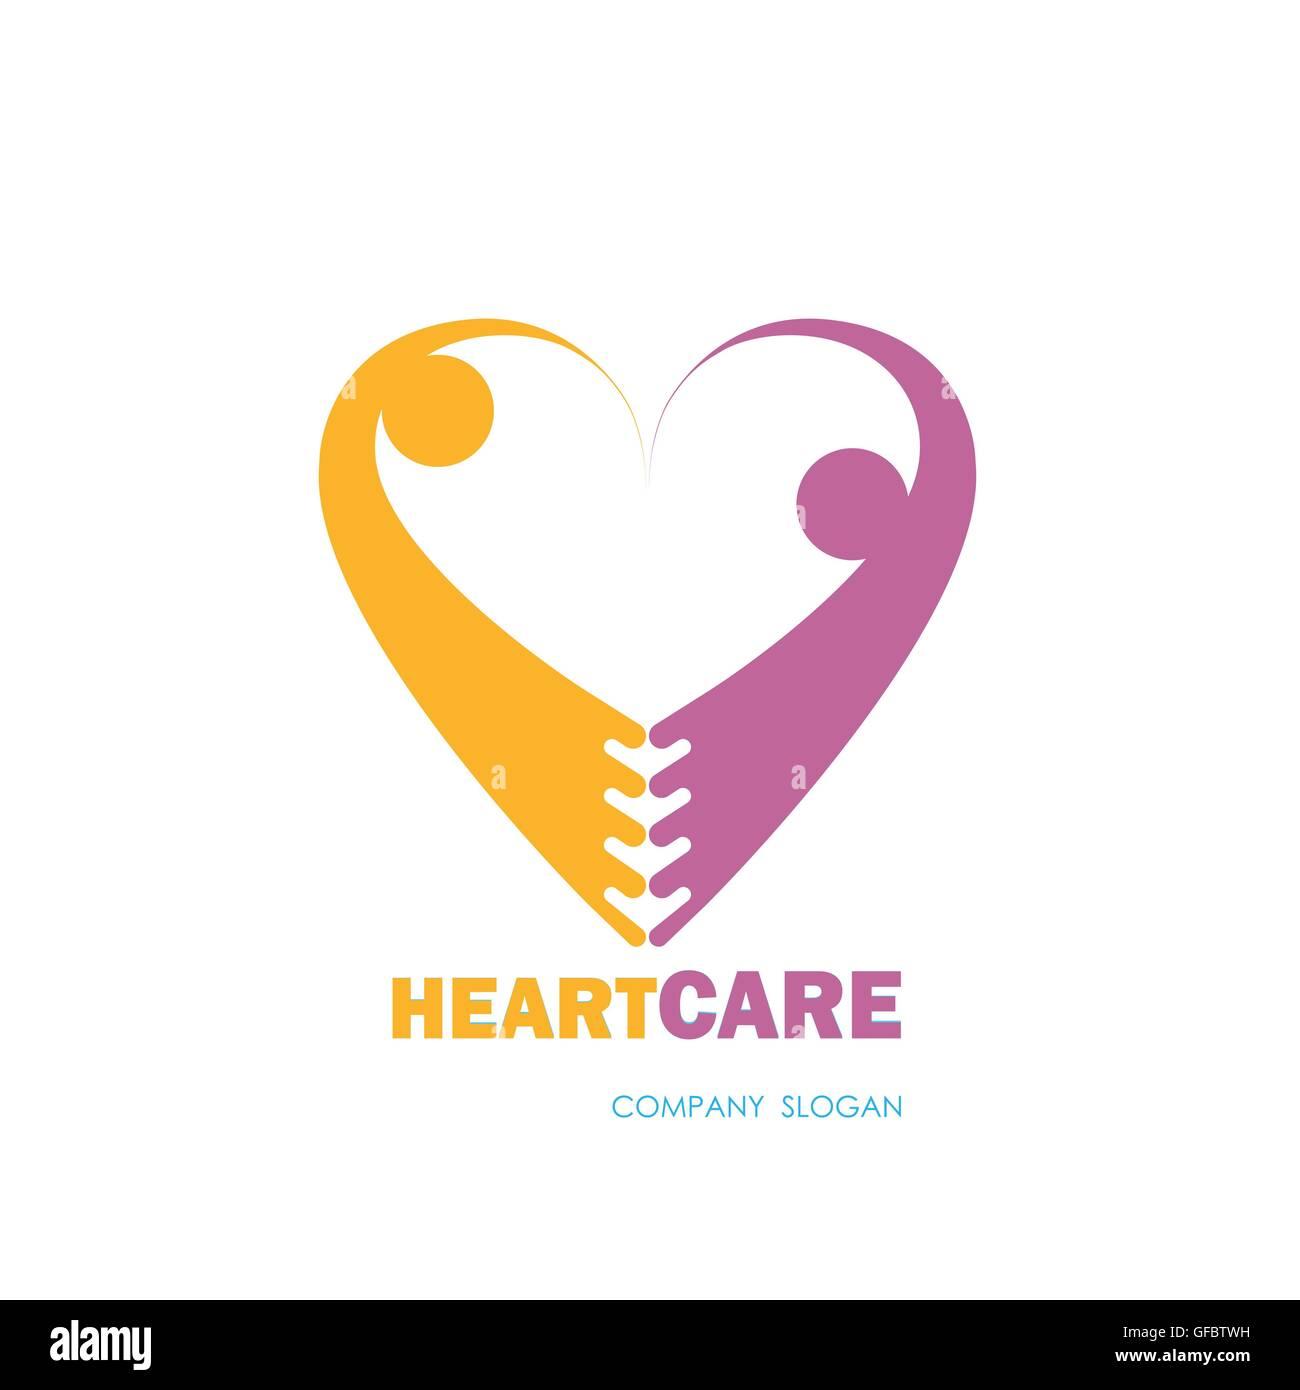 Health Care Medical Symbol Mit Herzform Herz Pflege Logo Vektor